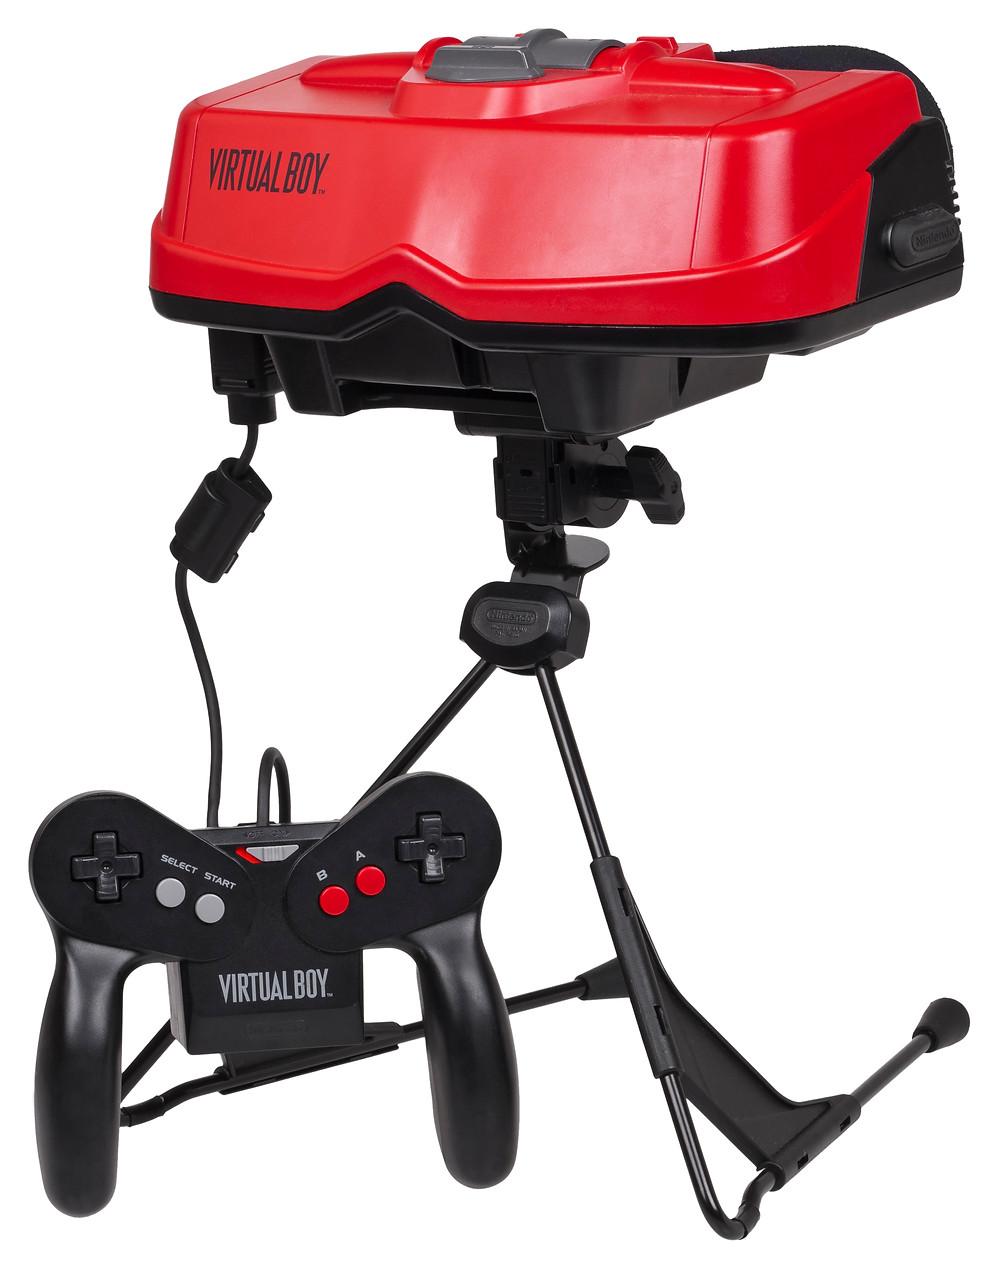 Virtual Boy Promo Image